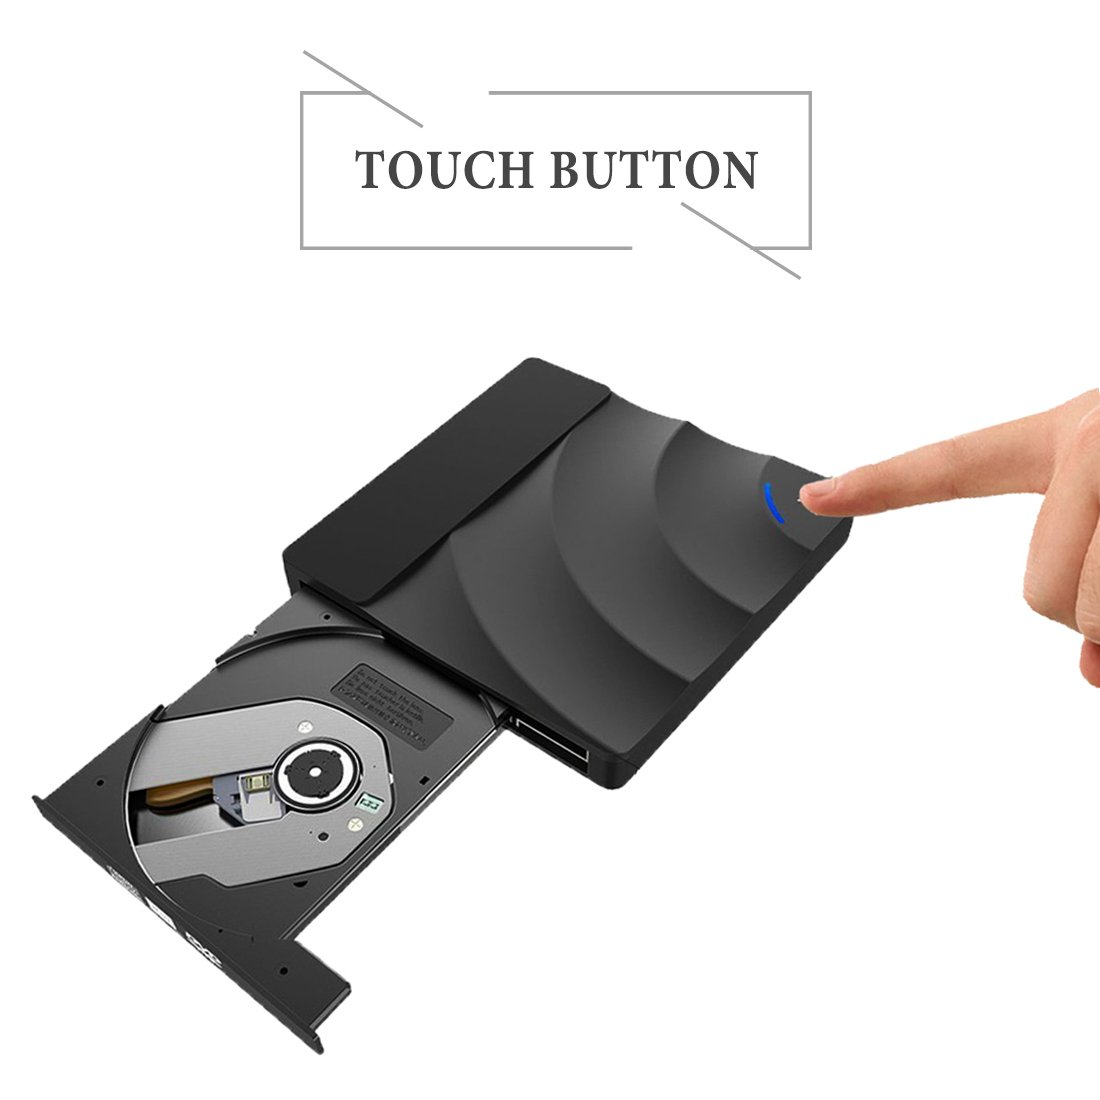 External DVD Drive, Sunreal USB 3.0 External CD DVD Burner Ultra Slim Portable Touch Control CD/DVD Writer Reader Player for Laptop/Desktop Support Window/Mac OS(Black) by Sunreal (Image #3)